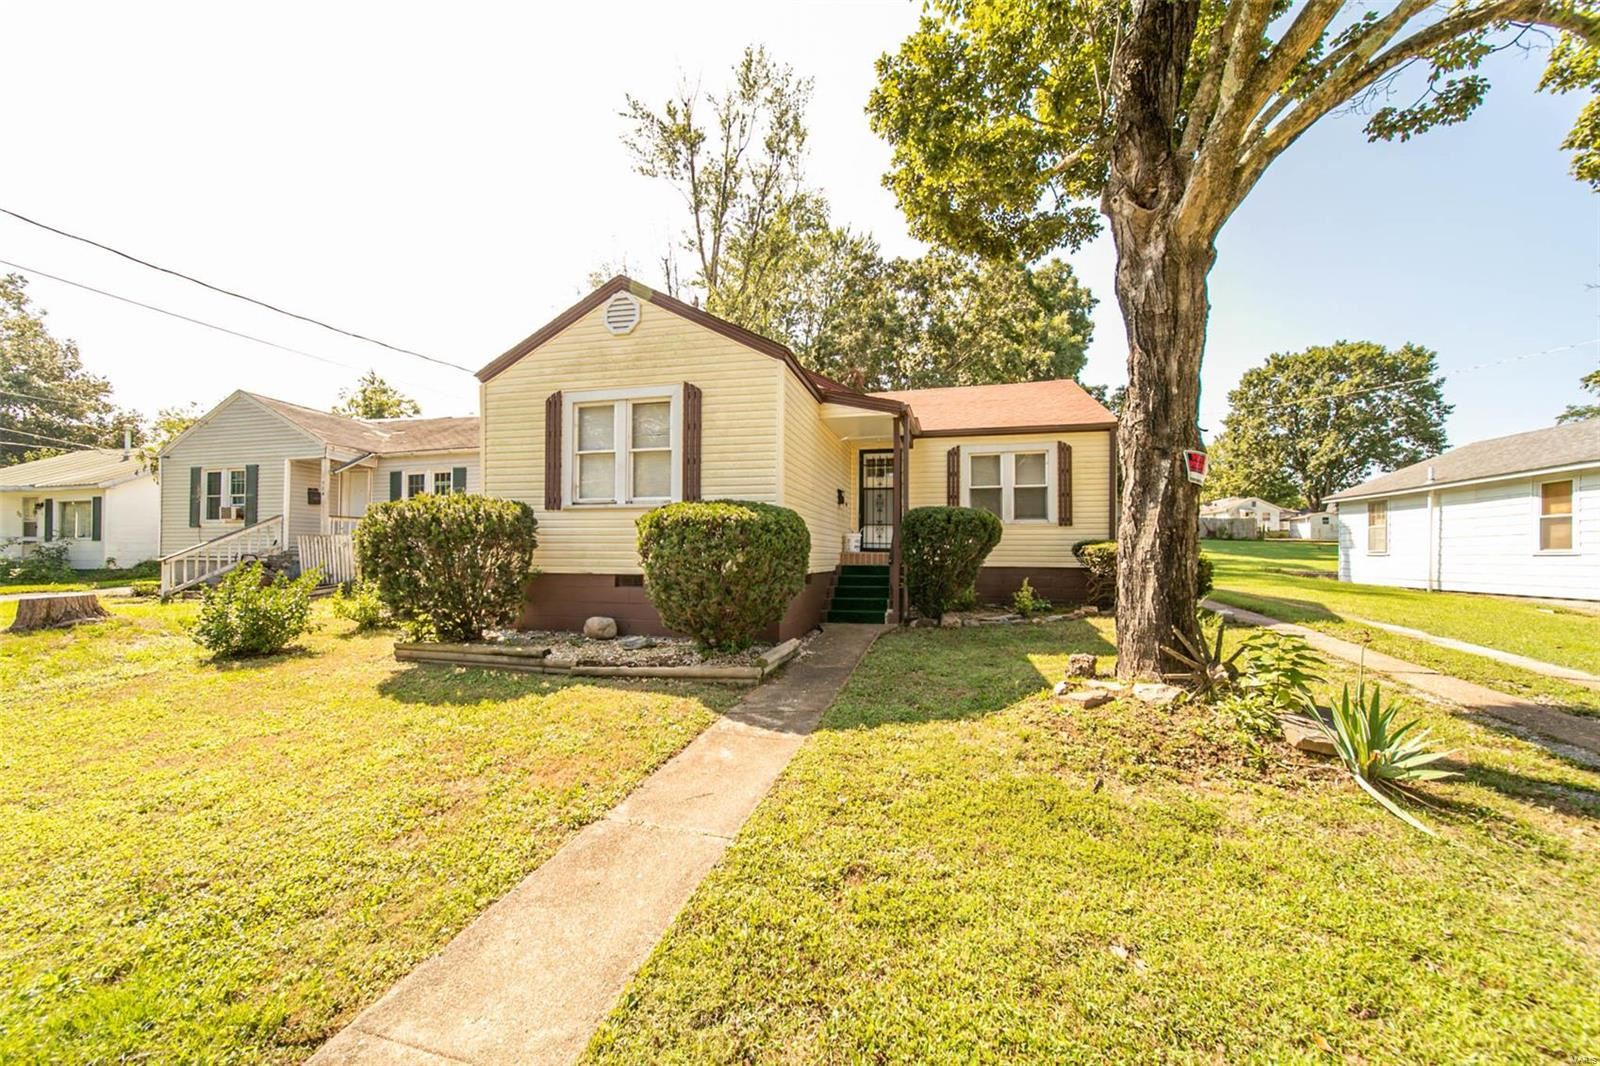 716 Ethel Street, Poplar Bluff, MO 63901 - MLS#: 21058520